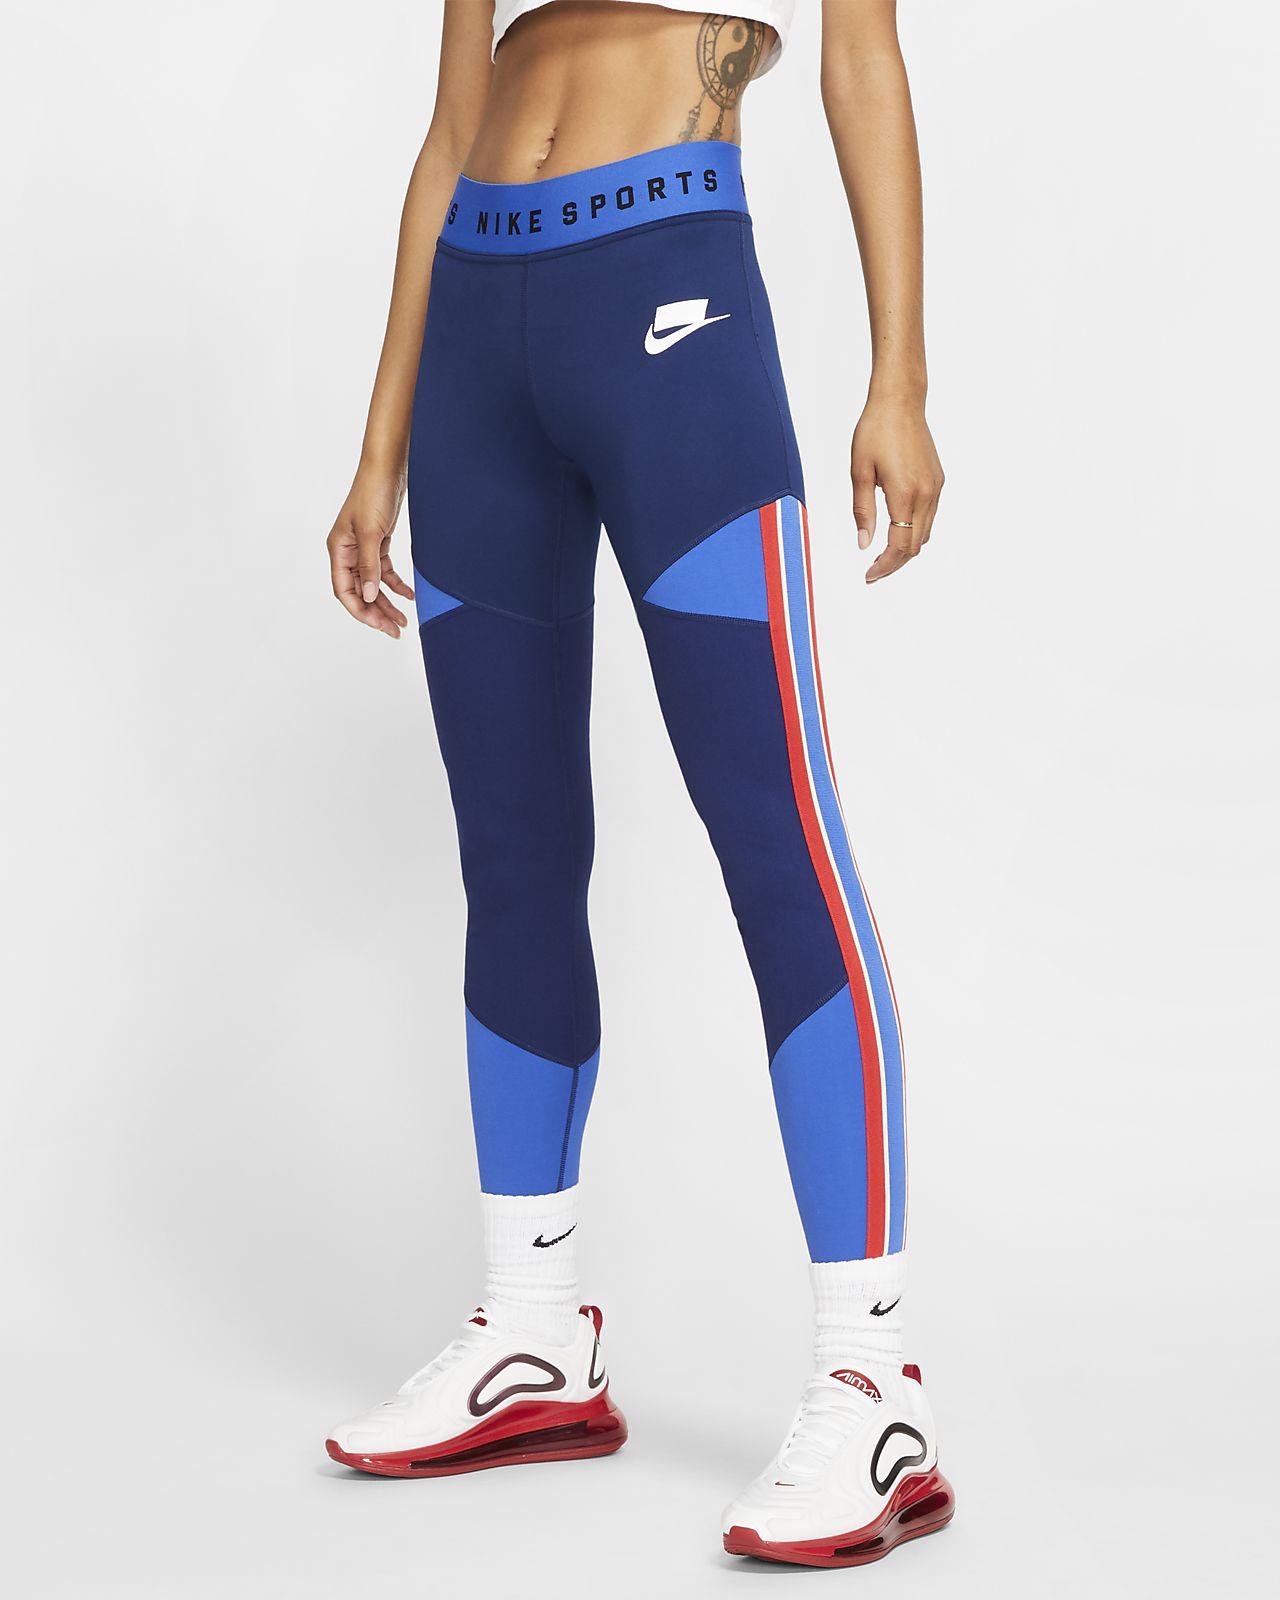 Женские леггинсы с графикой Nike Sportswear NSW